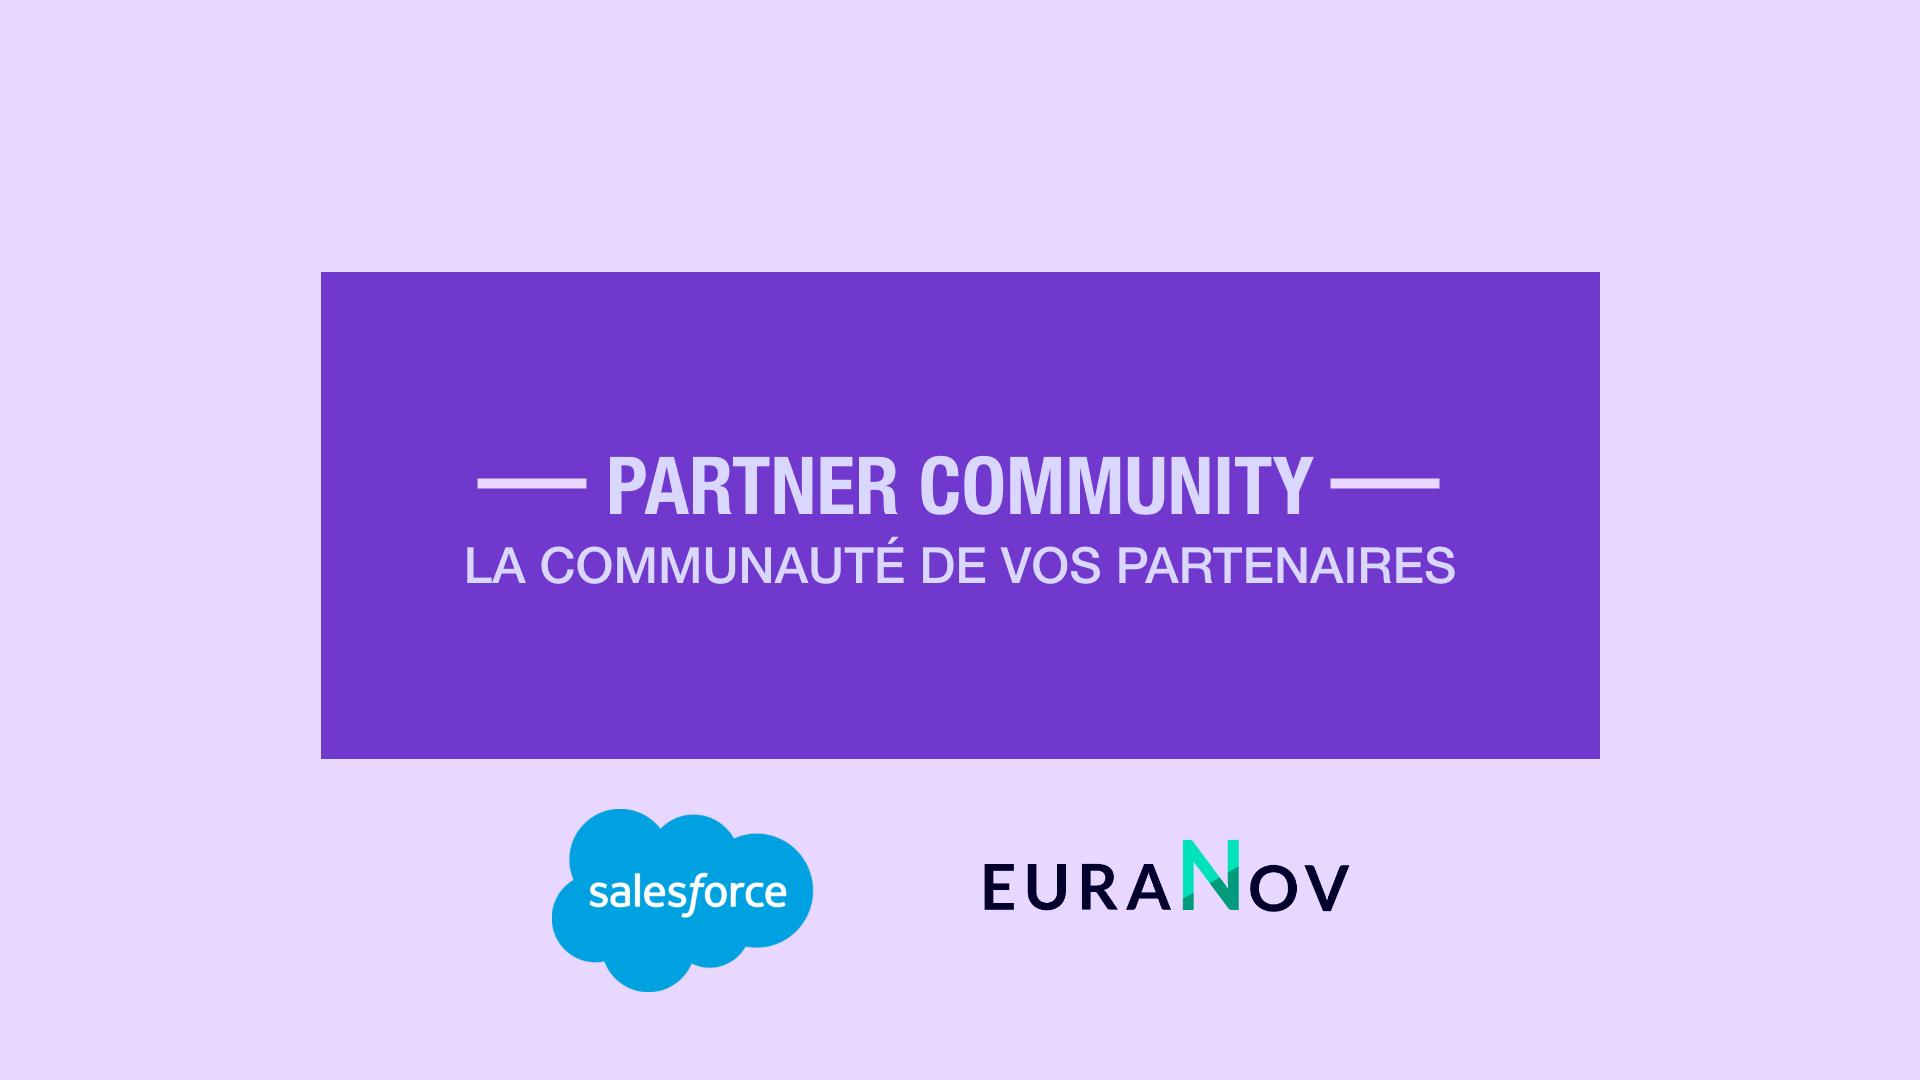 Image partner community